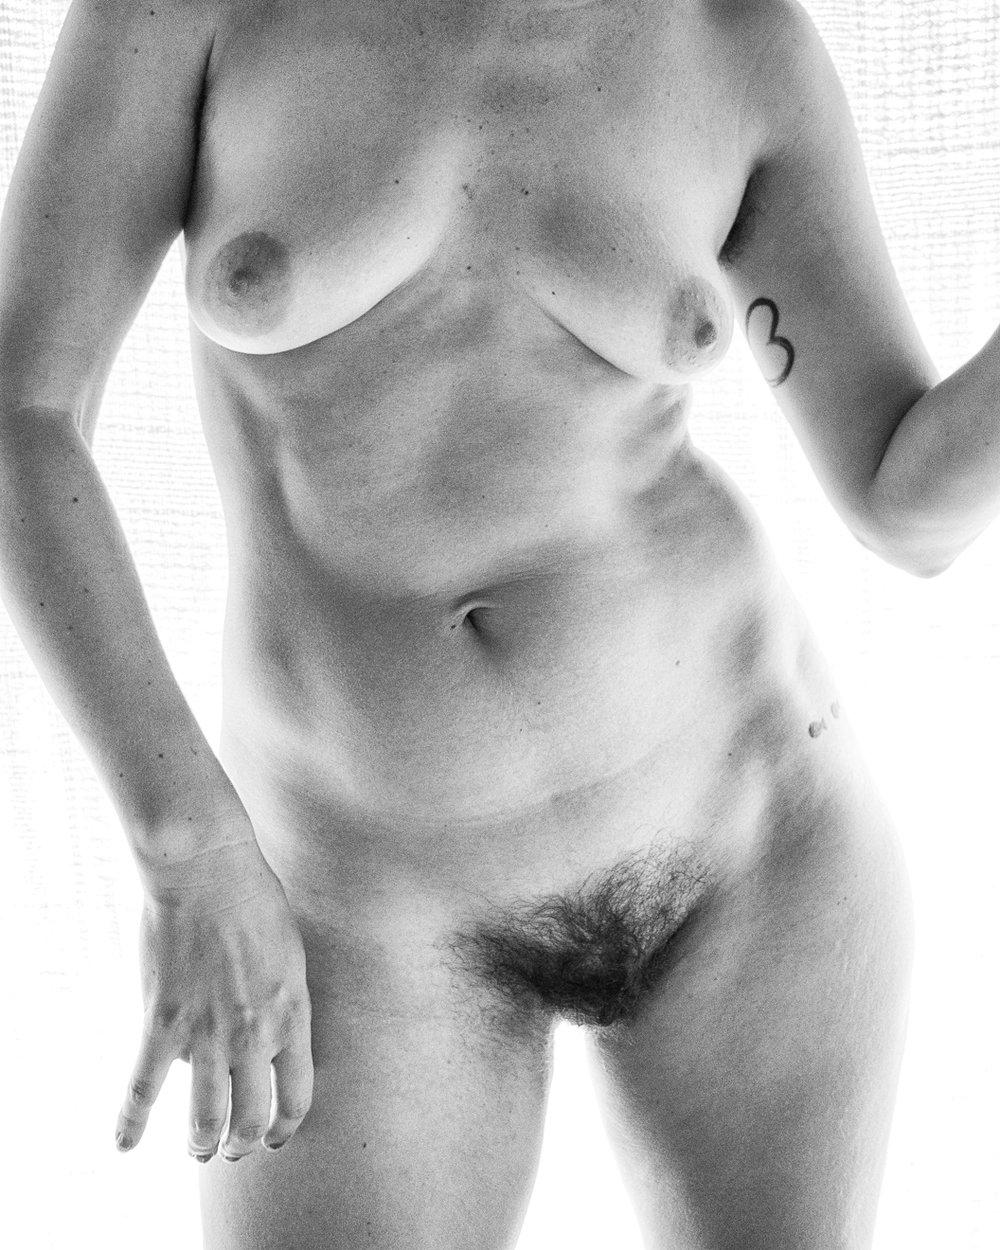 Audrey_B+W Body-9.jpg